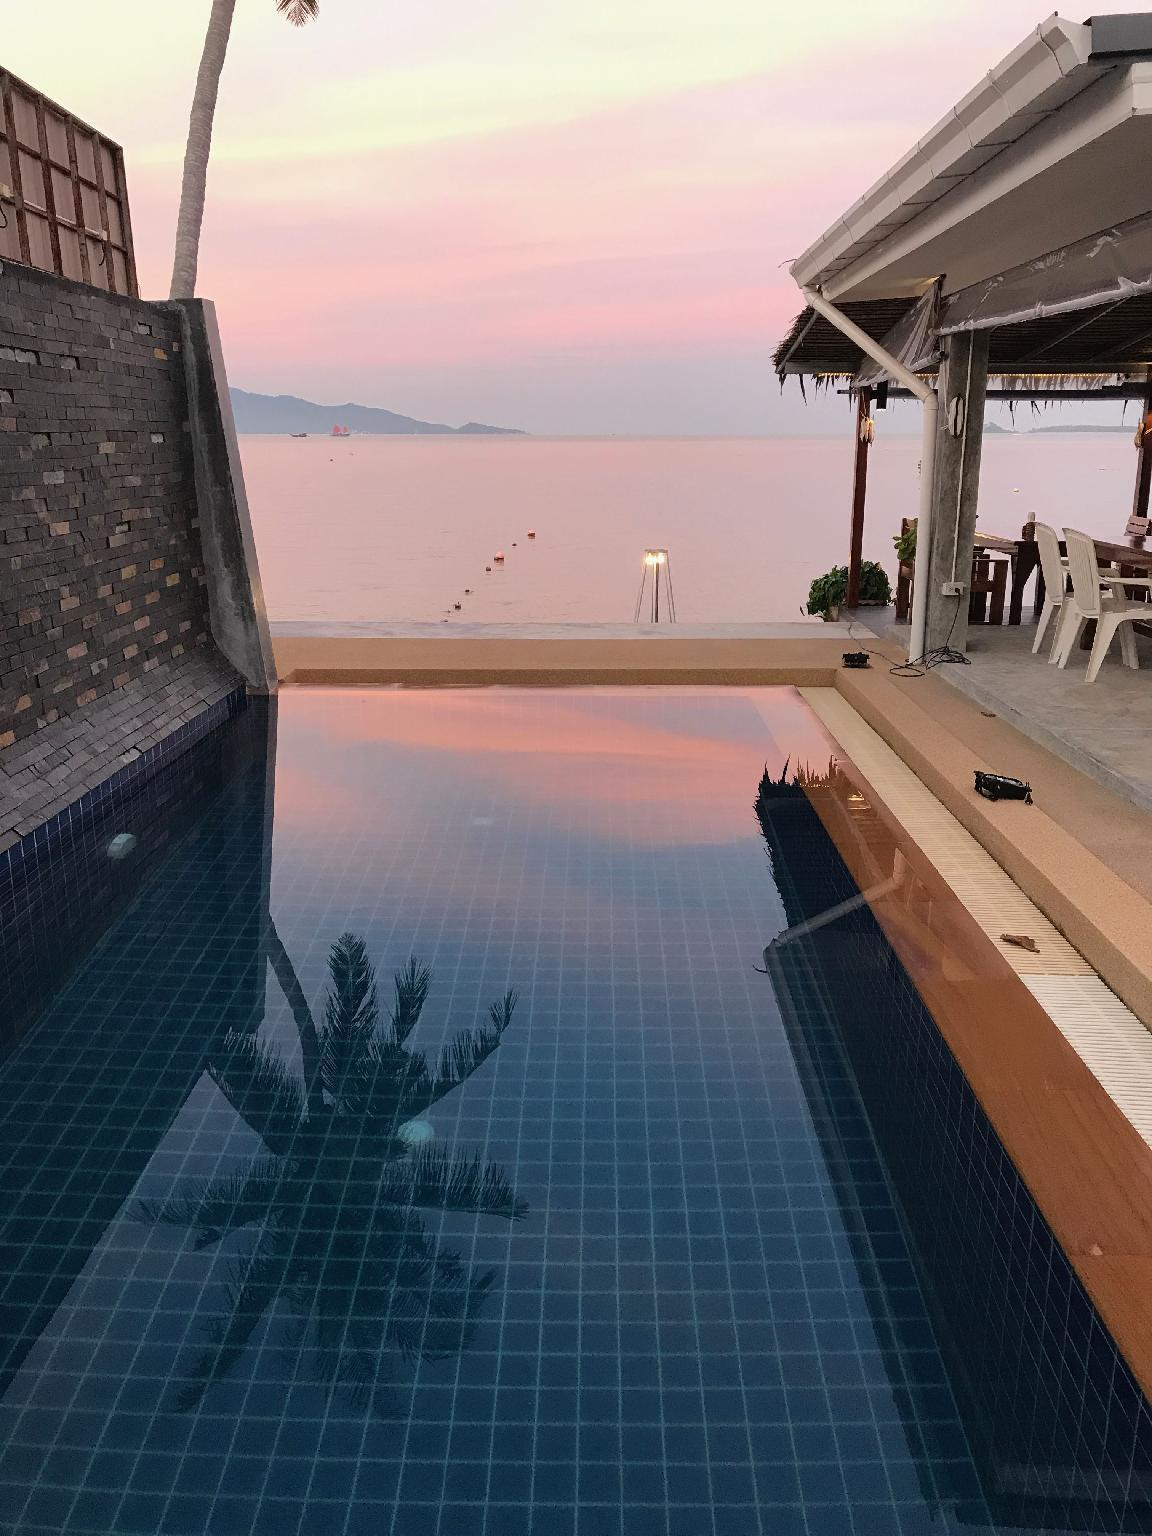 Pico Beach Bungalows and Resort ปิโก บีช บังกะโล แอนด์ รีสอร์ต